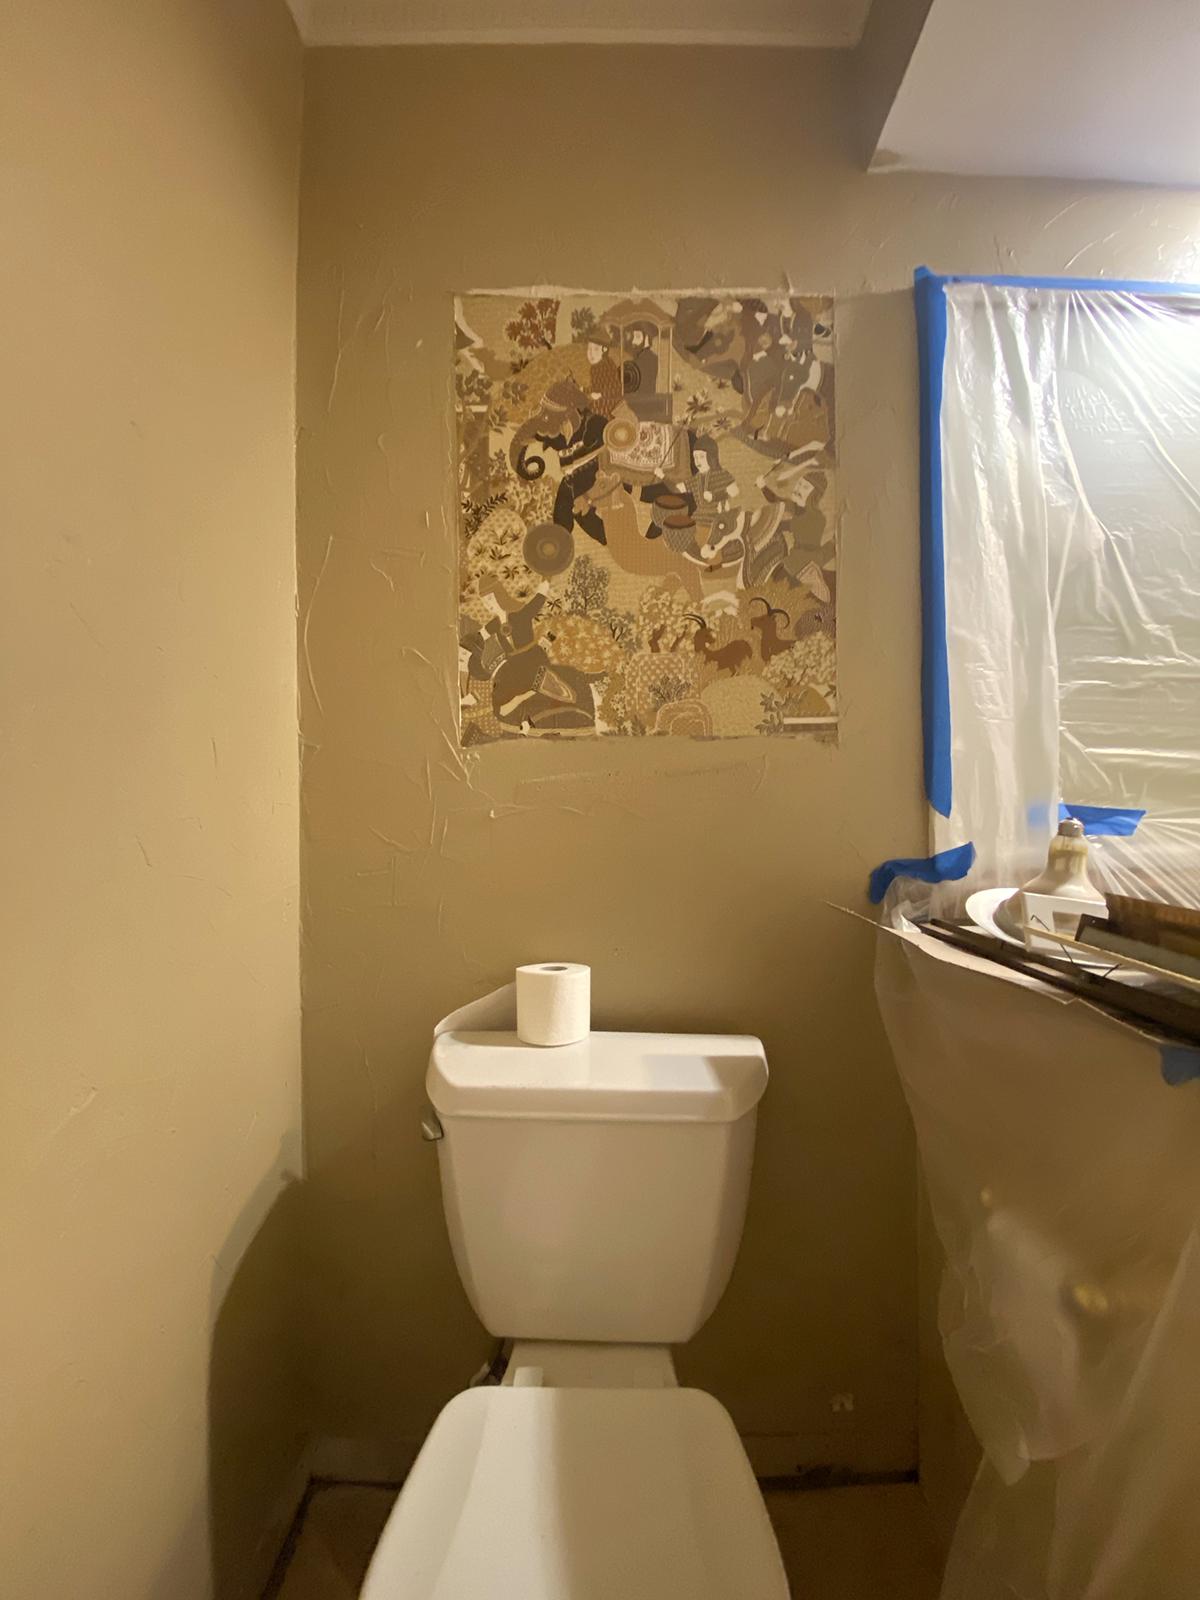 Wallpaper above toilet - sneak peak a bit closer still